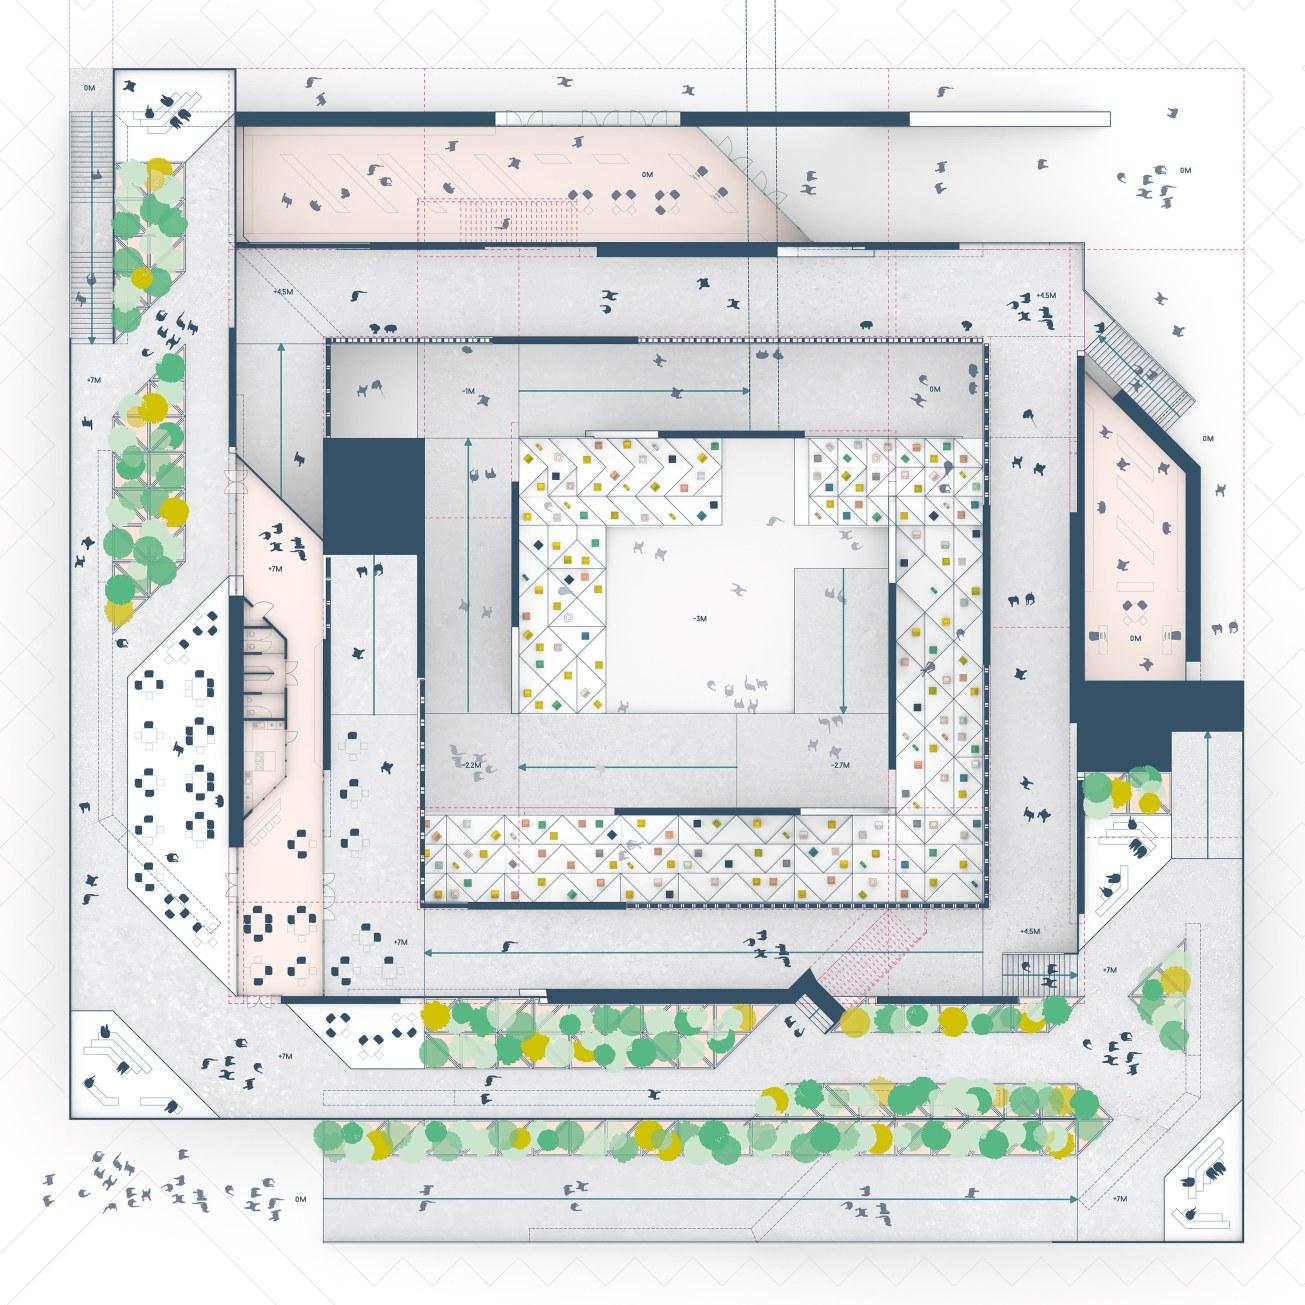 02_templodelosmuertos_lichtenwagner_2016_UniversityofAppliedArtsVienna_ArchitectureStudioGregLynn